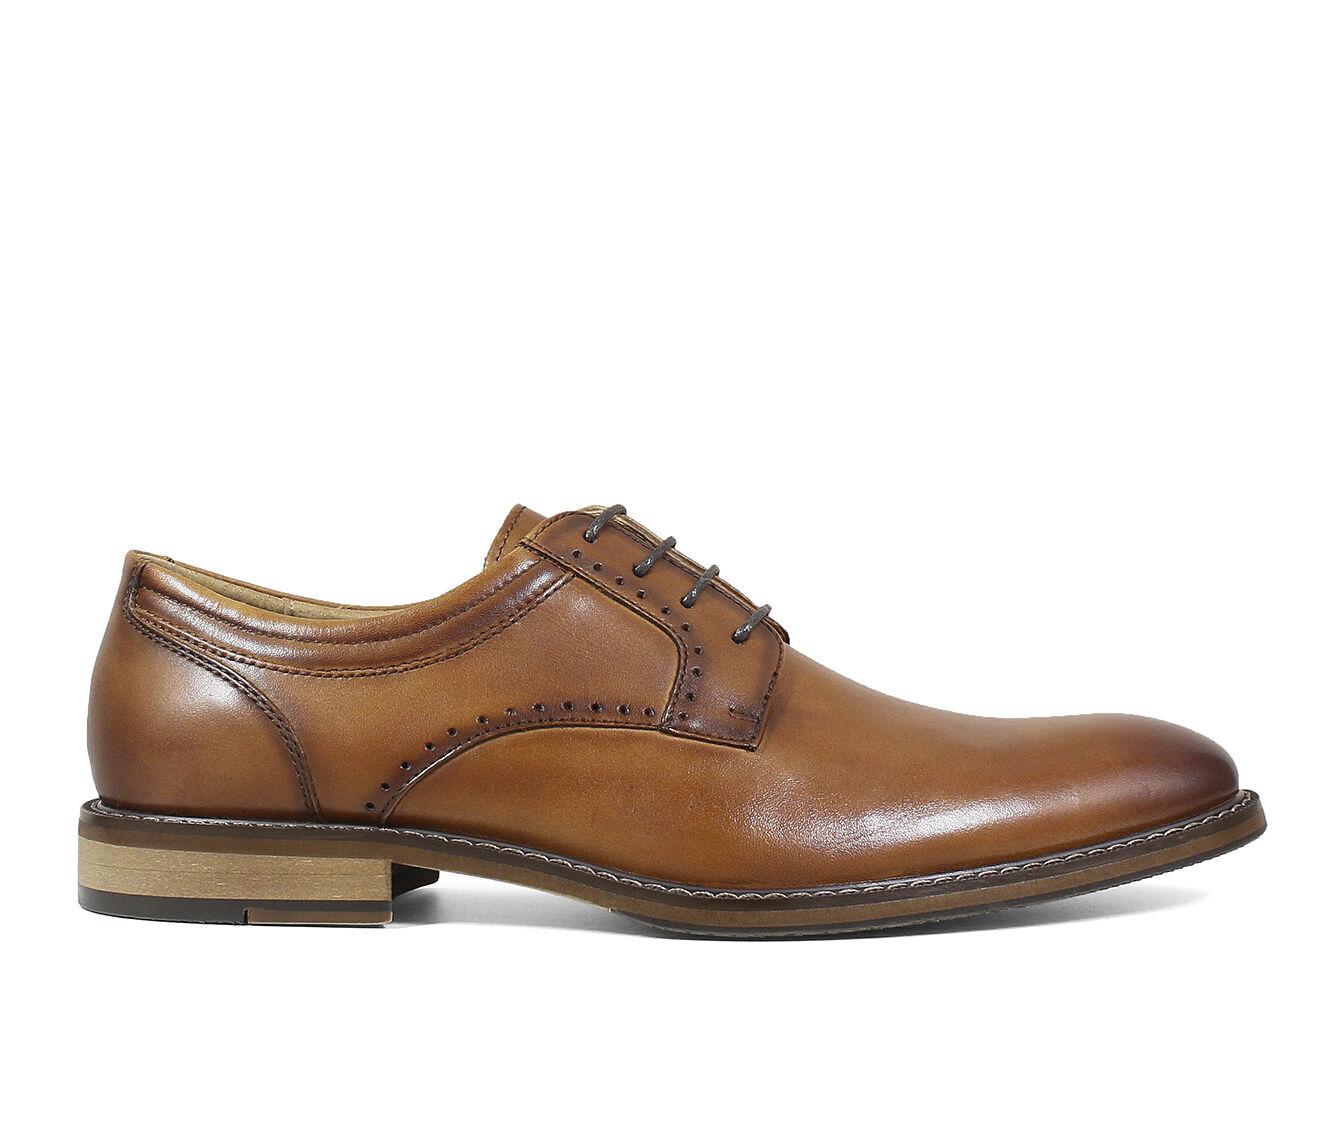 global ship Men's Stacy Adams Faulkner Dress Shoes Cognac